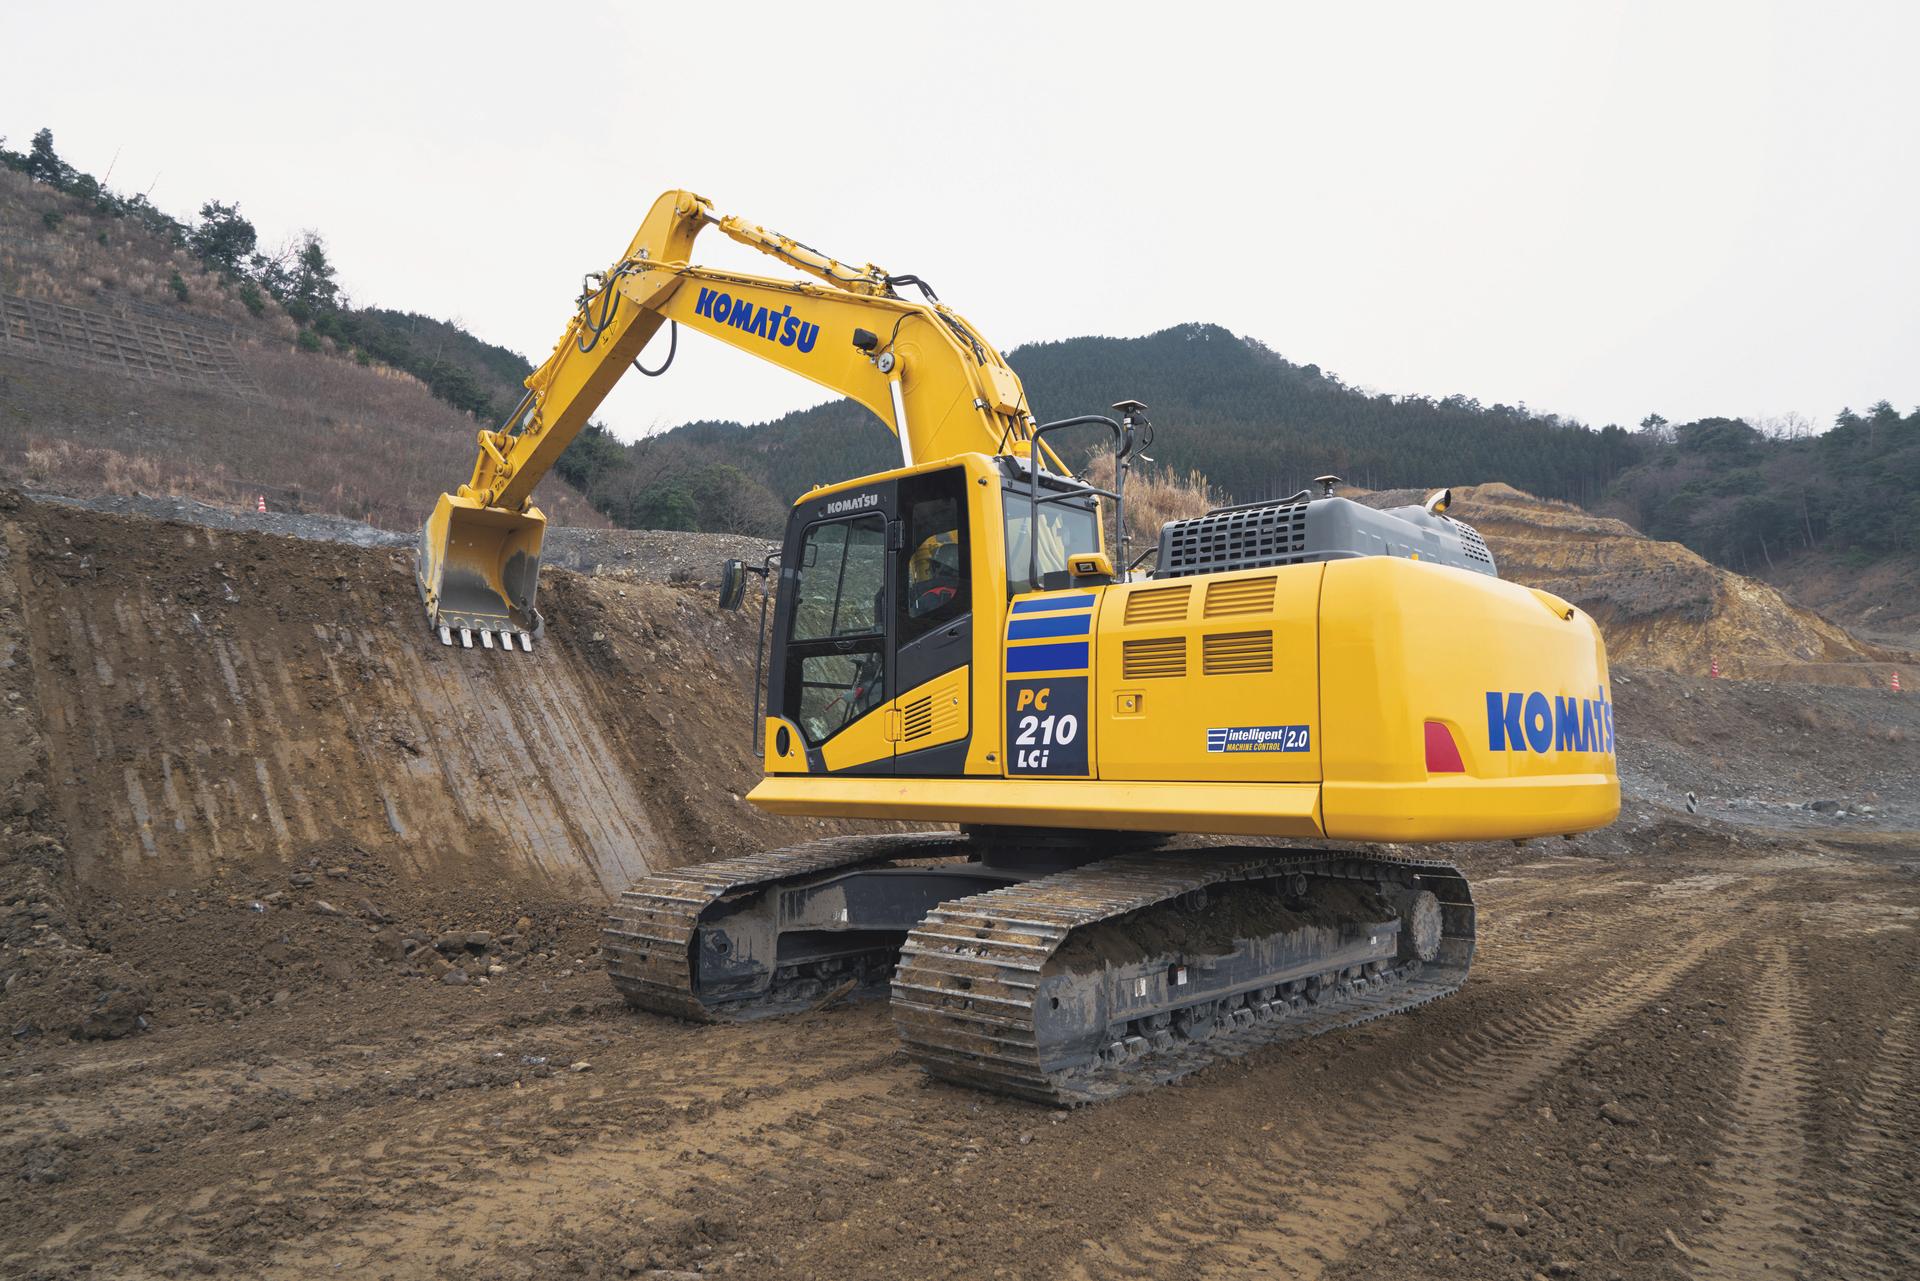 Komatsu PC210LC excavator